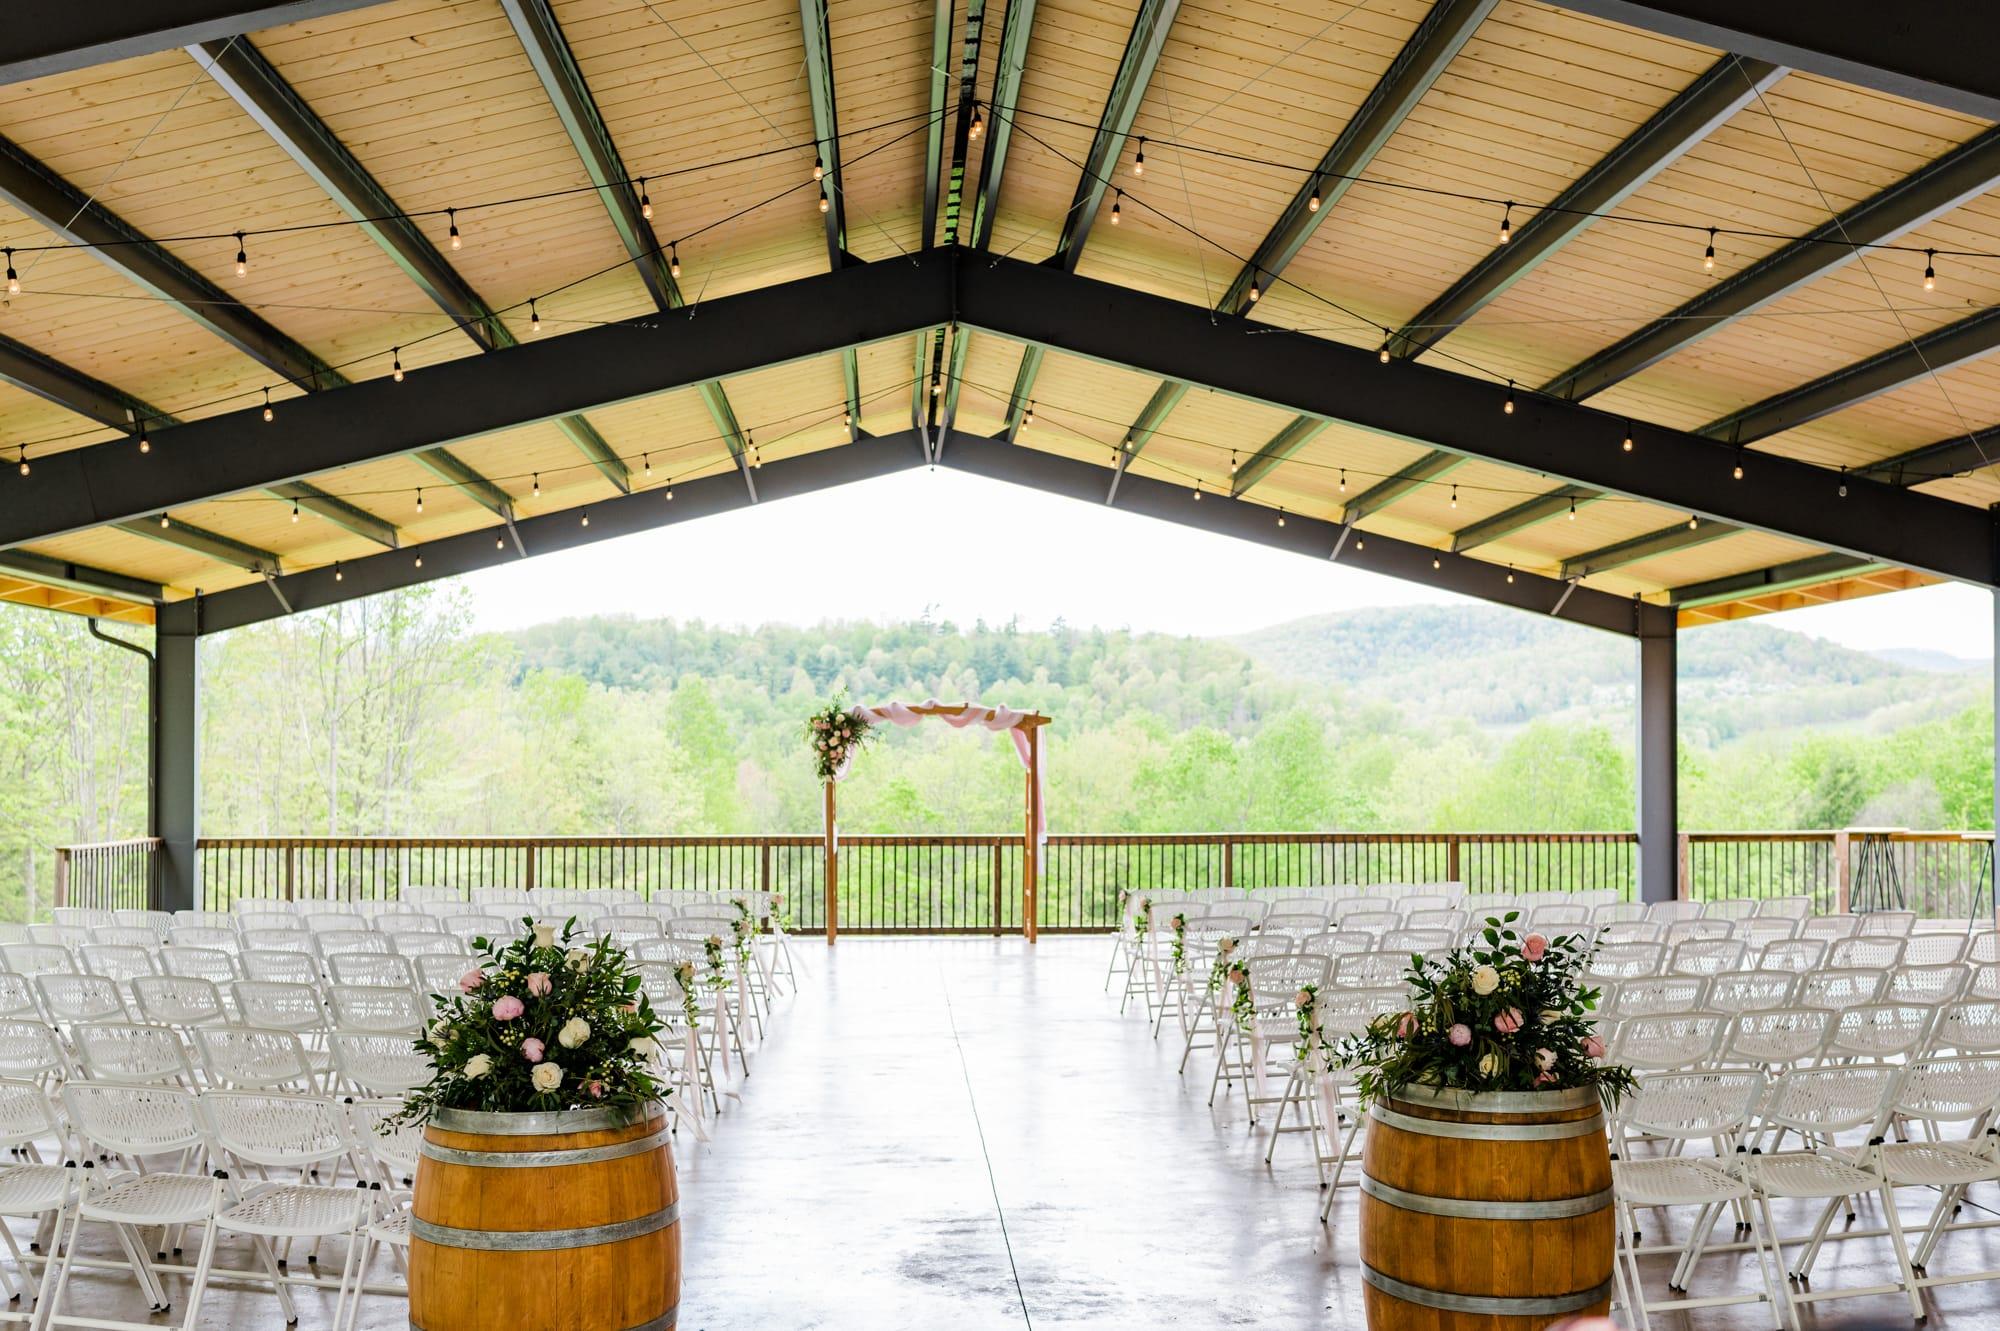 Ceremony decor at Rolling Rails Lodge wedding